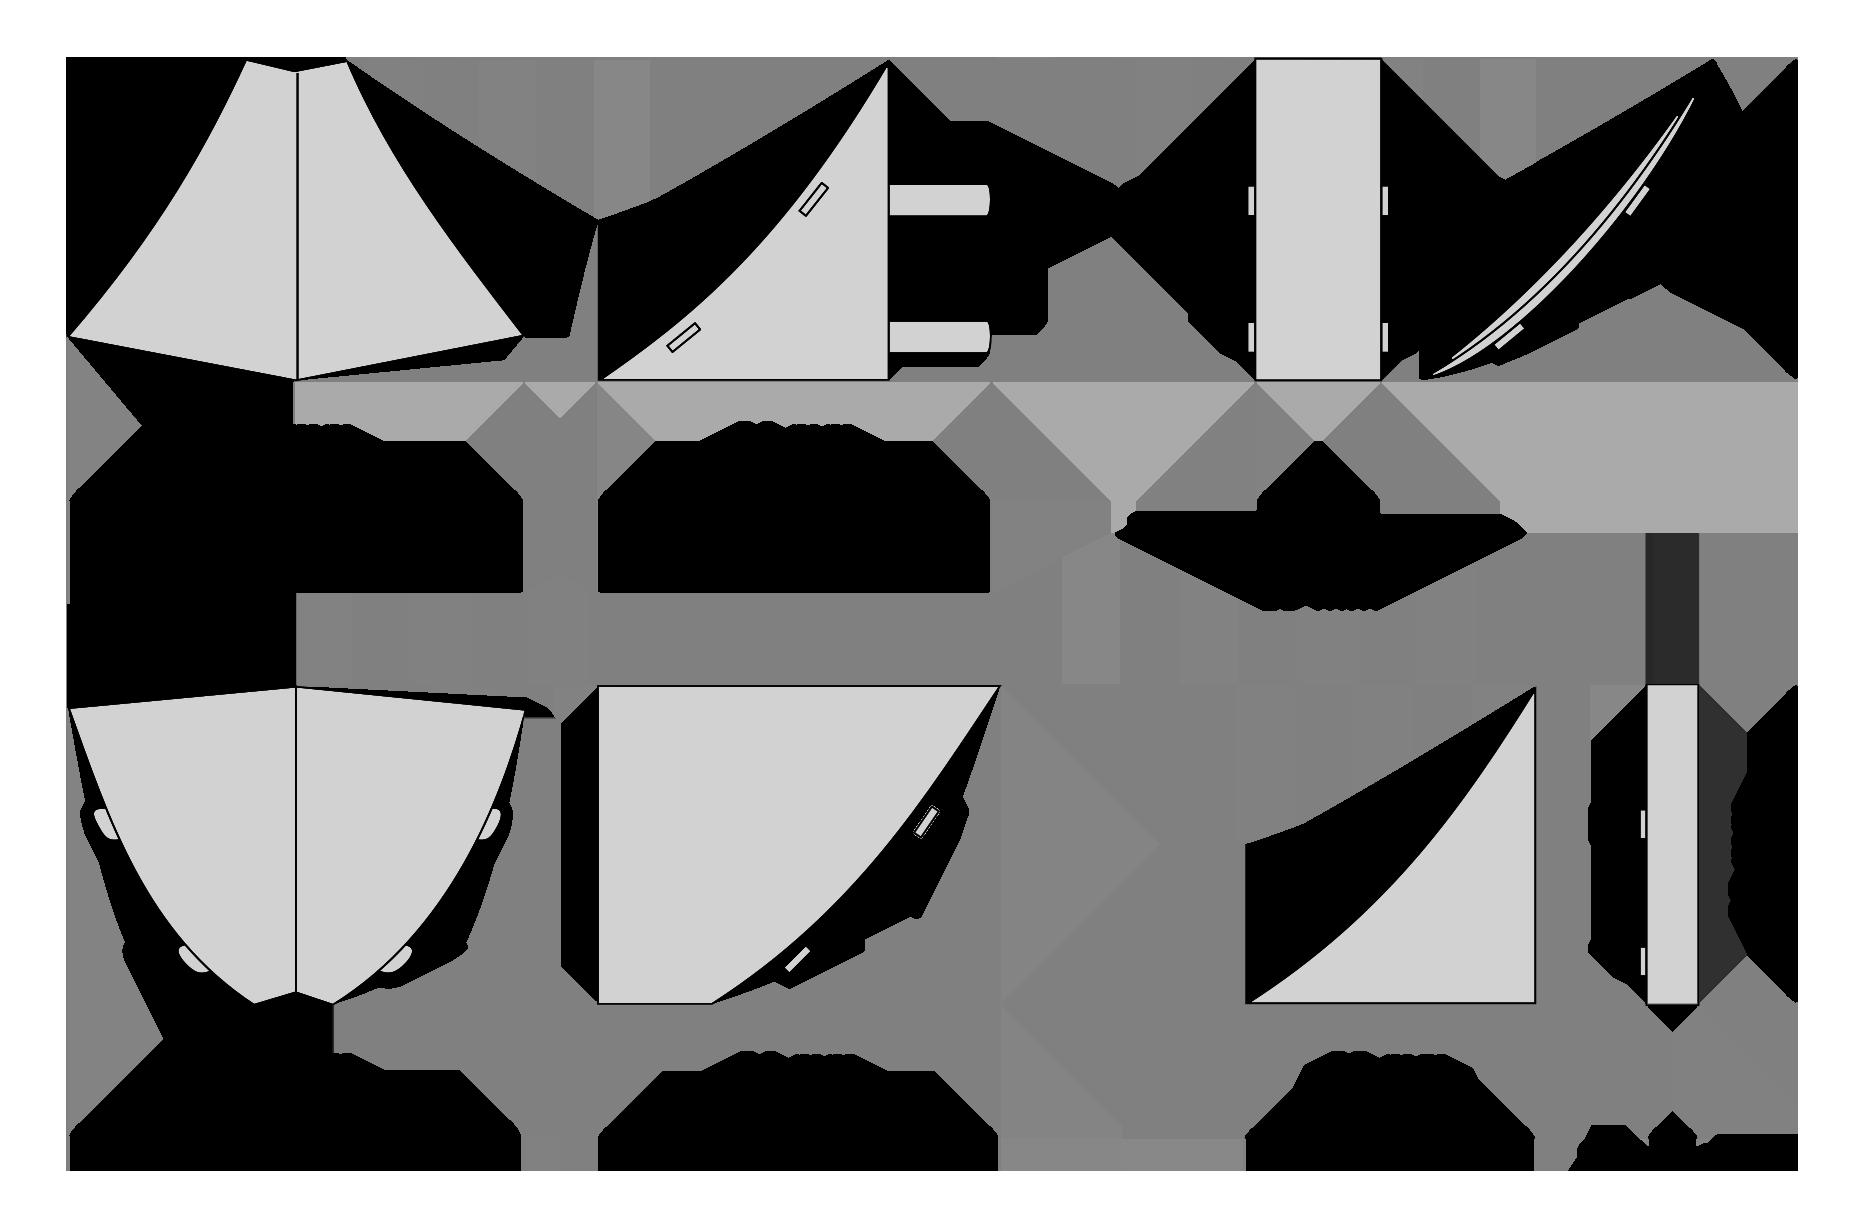 23 x 23mm DQ-PP MUSTER WINKELLEISTE K/üchenleiste Arbeitsplatte Abschlussleiste Leiste K/üche K/üchenabschlussleiste Wandabschlussleiste Tischplattenleisten PVC Chrom